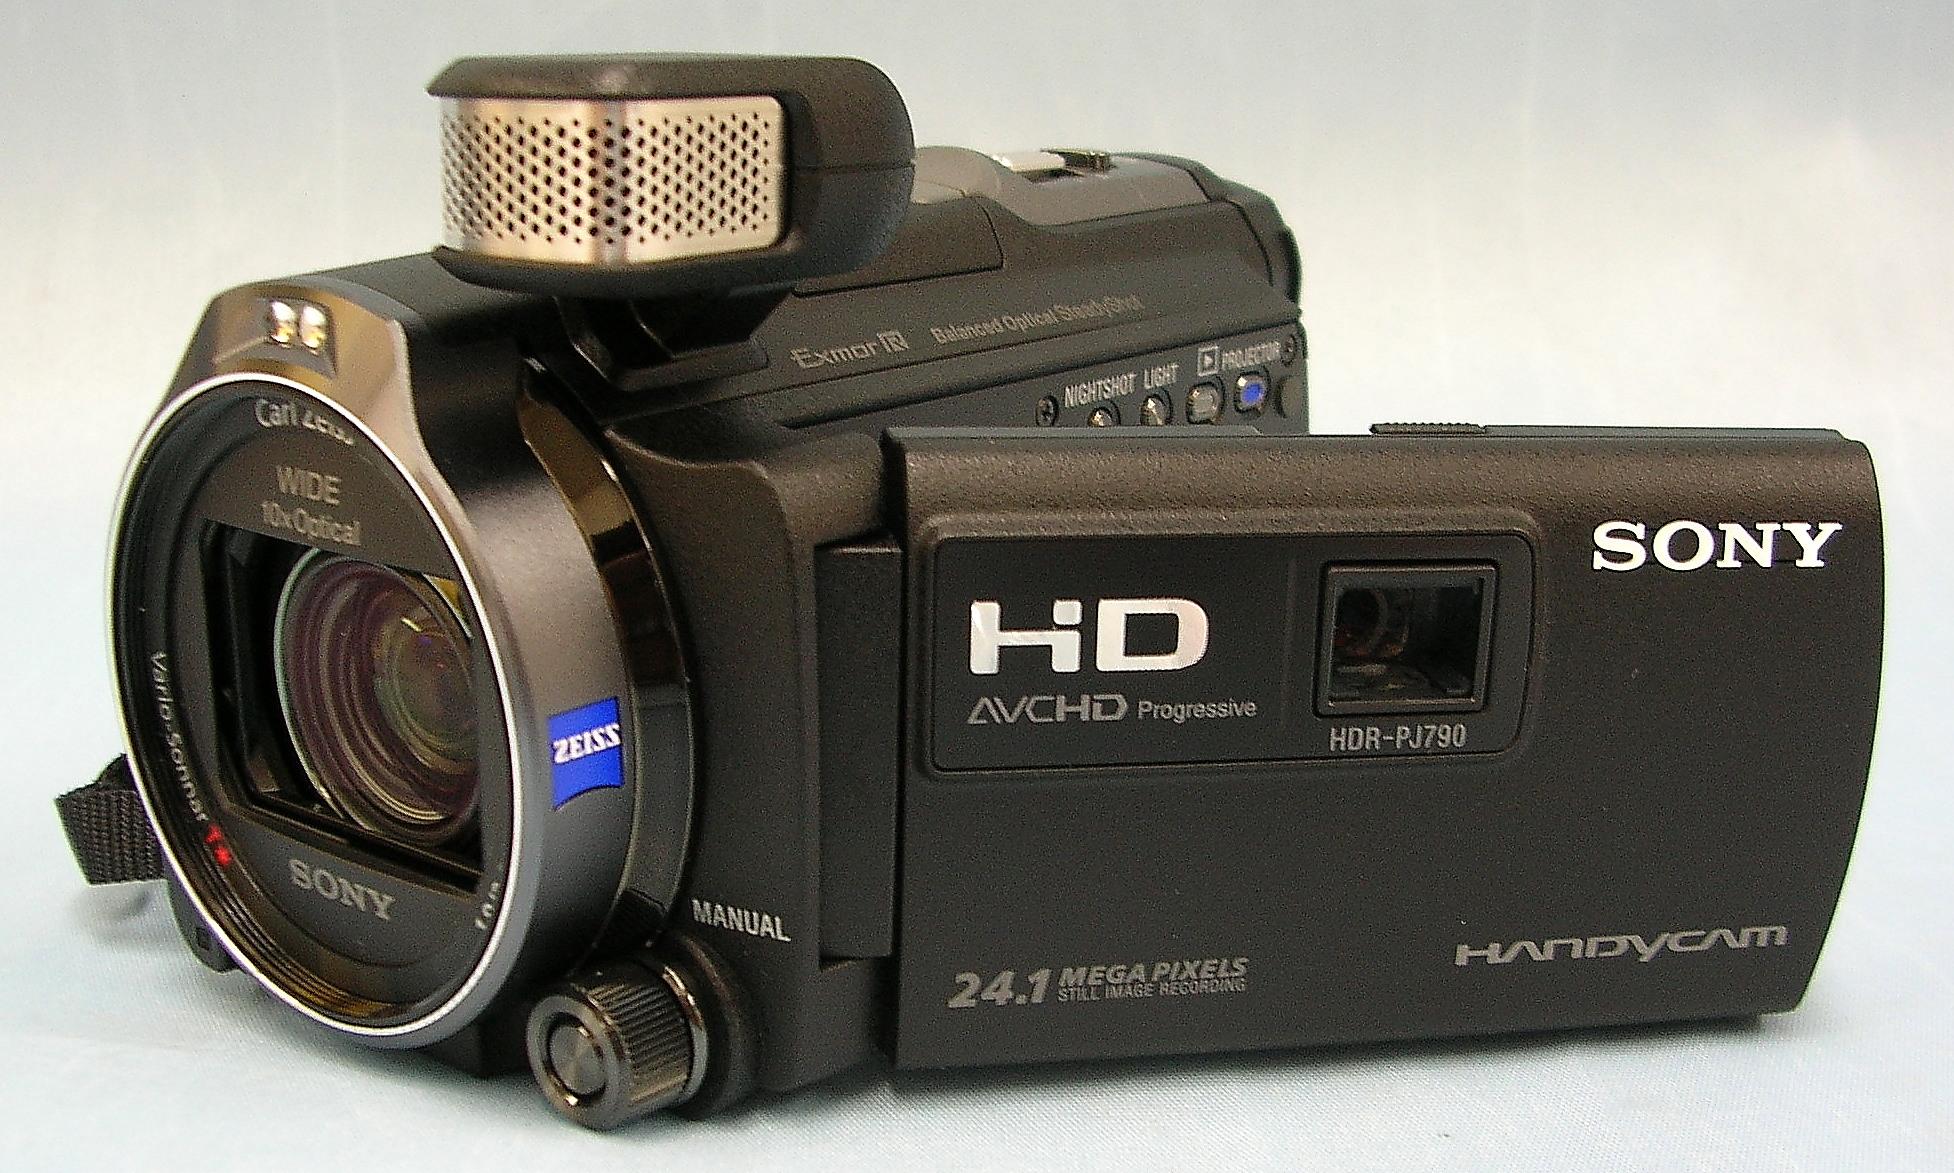 SONY ビデオカメラ HDR-PJ790V